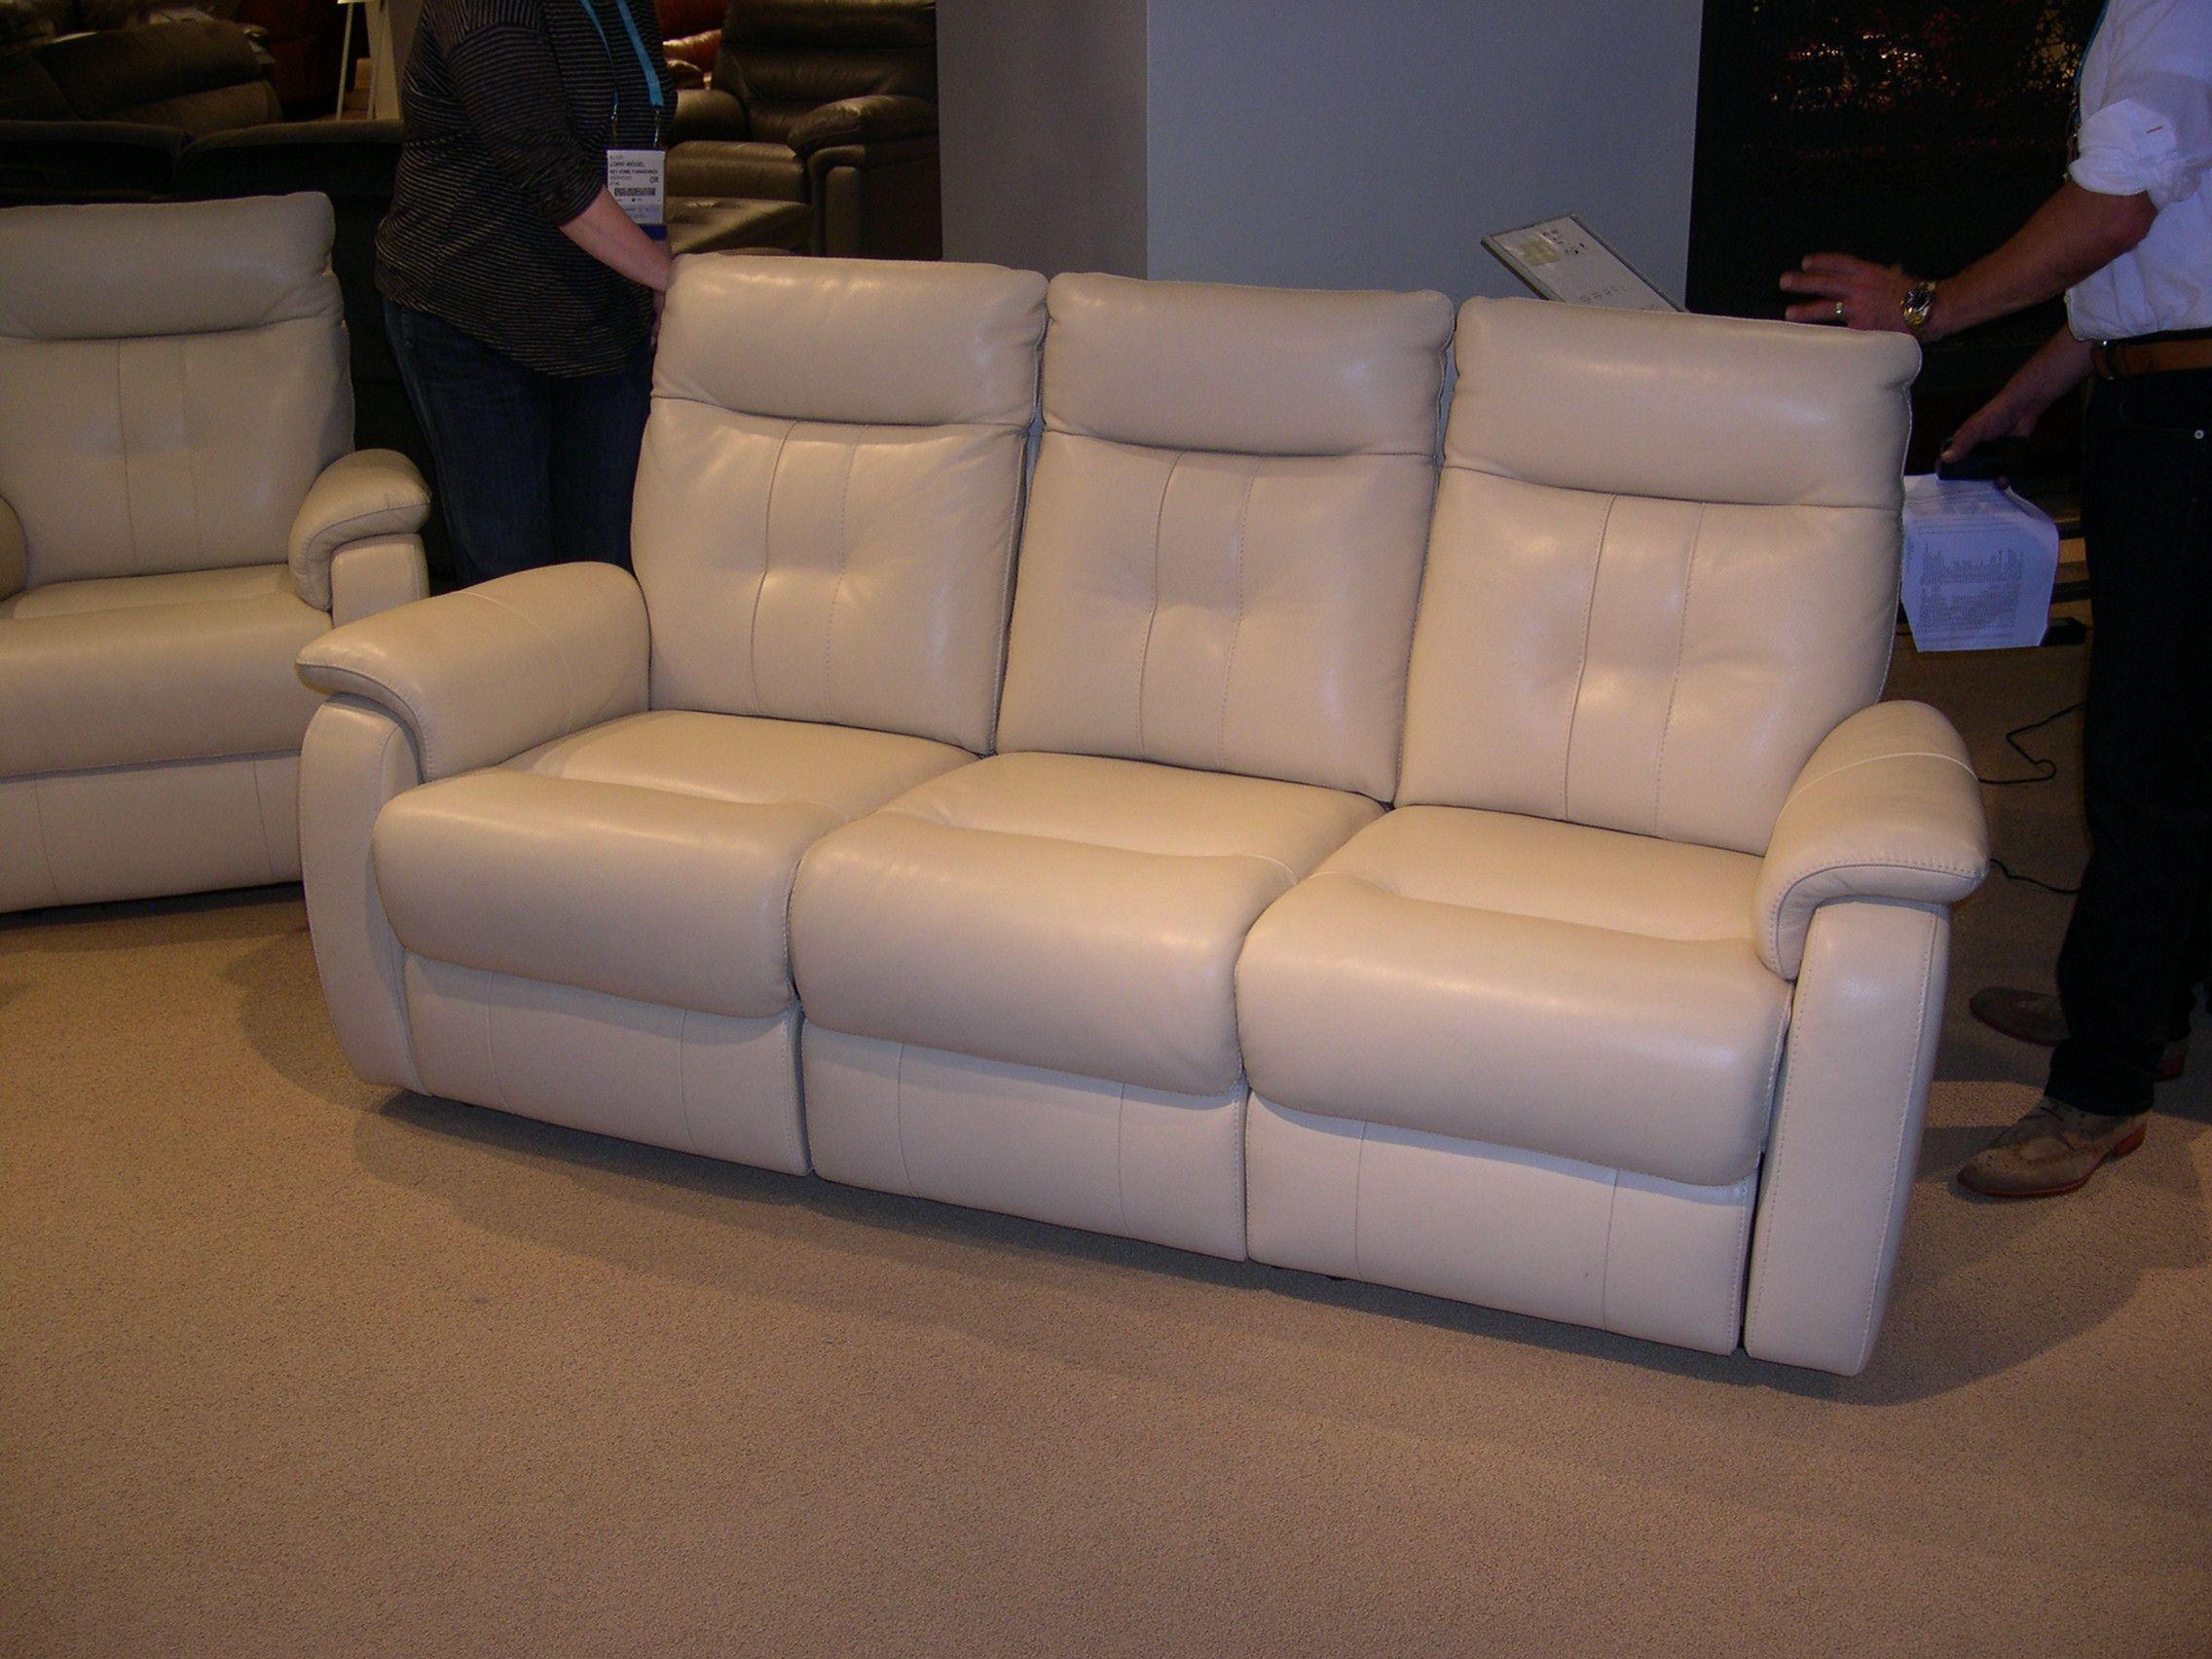 htl sofa range white chesterfield uk leather sofas accent furniturewebsite